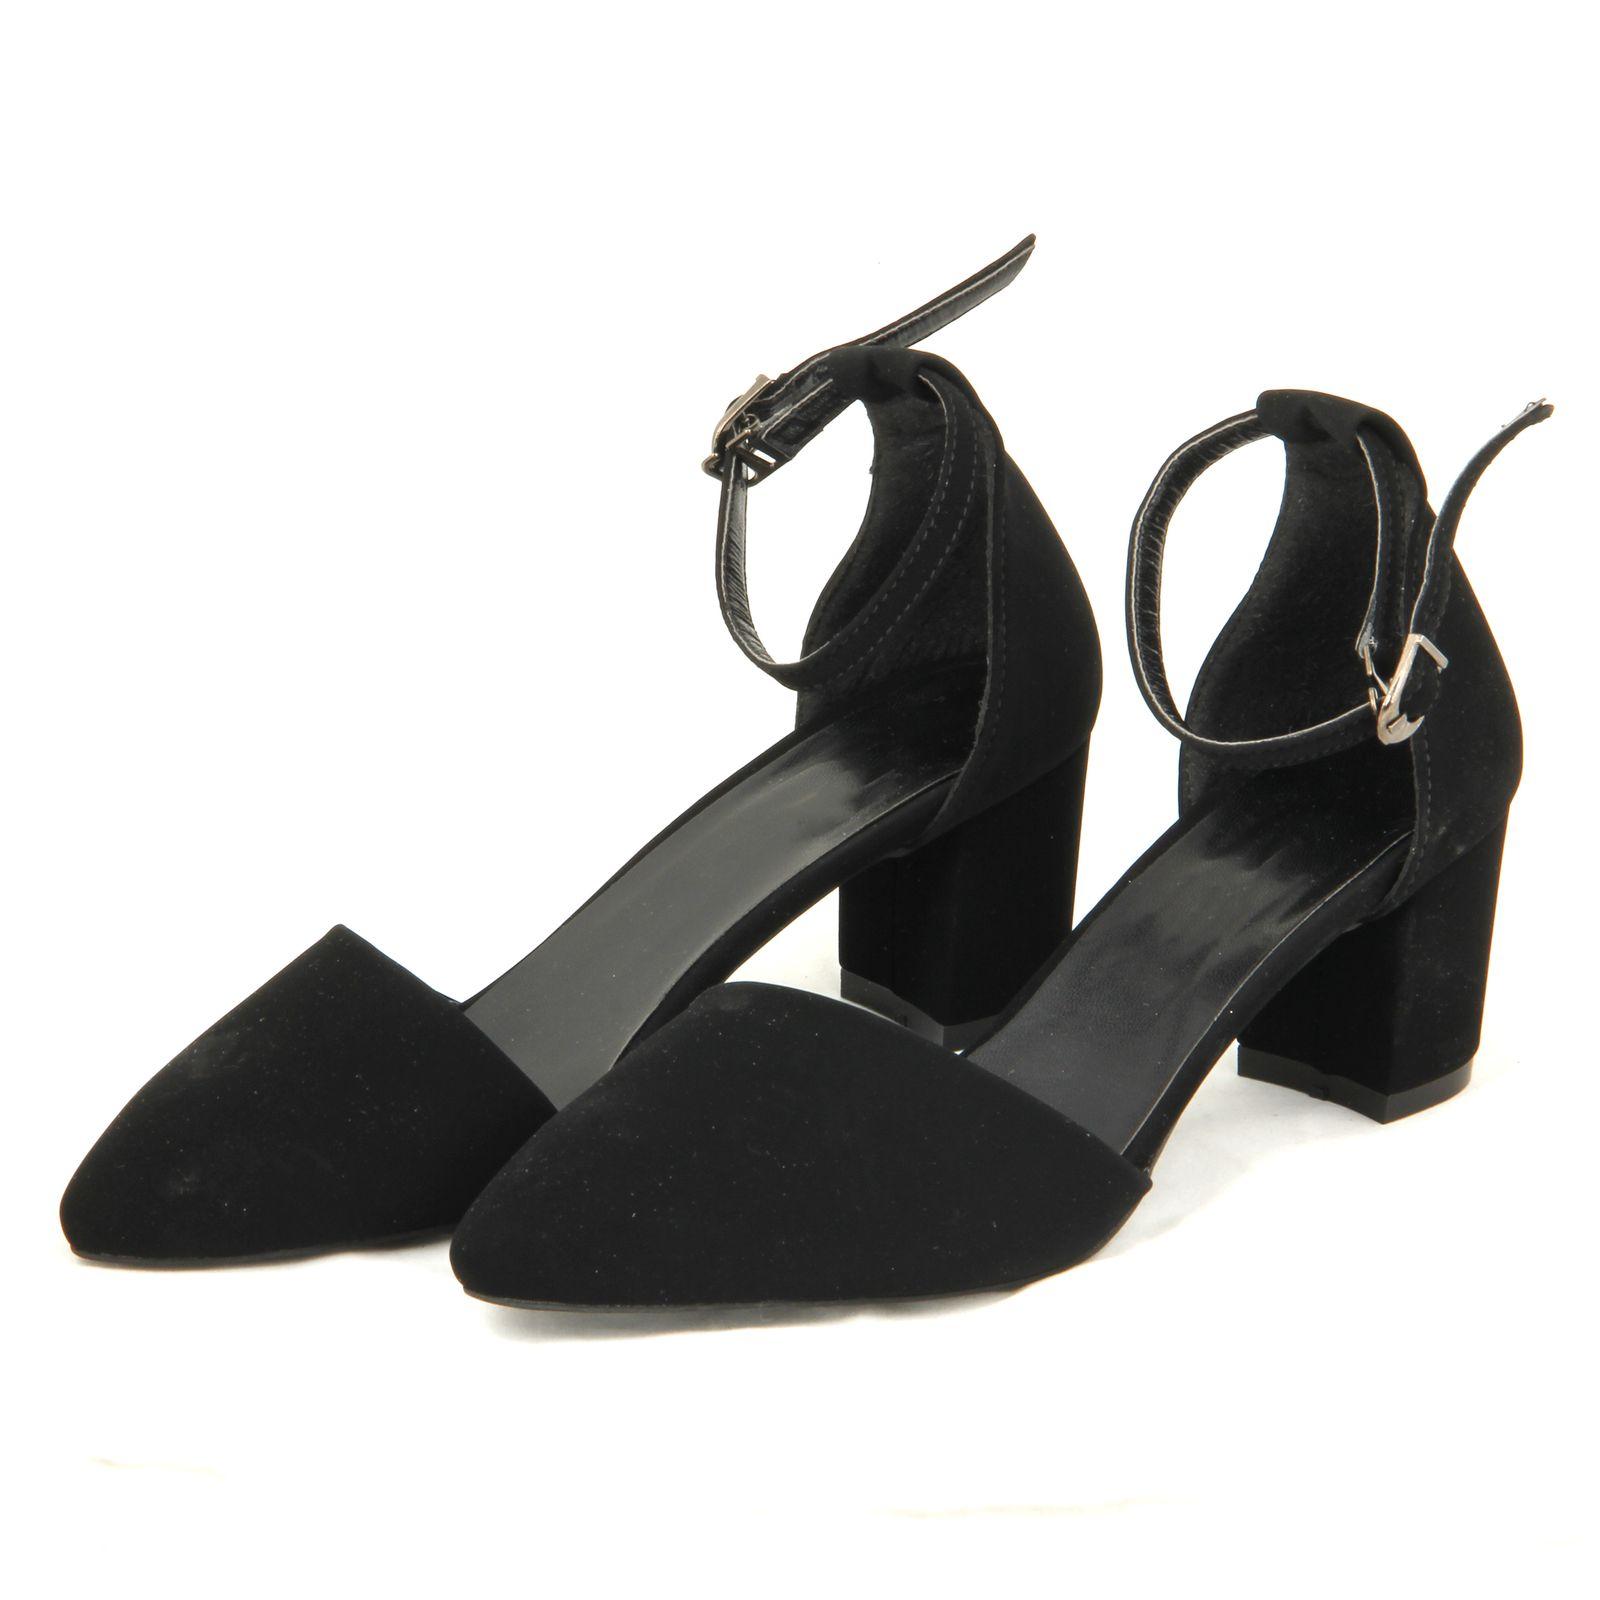 کفش زنانه کد 484 -  - 3